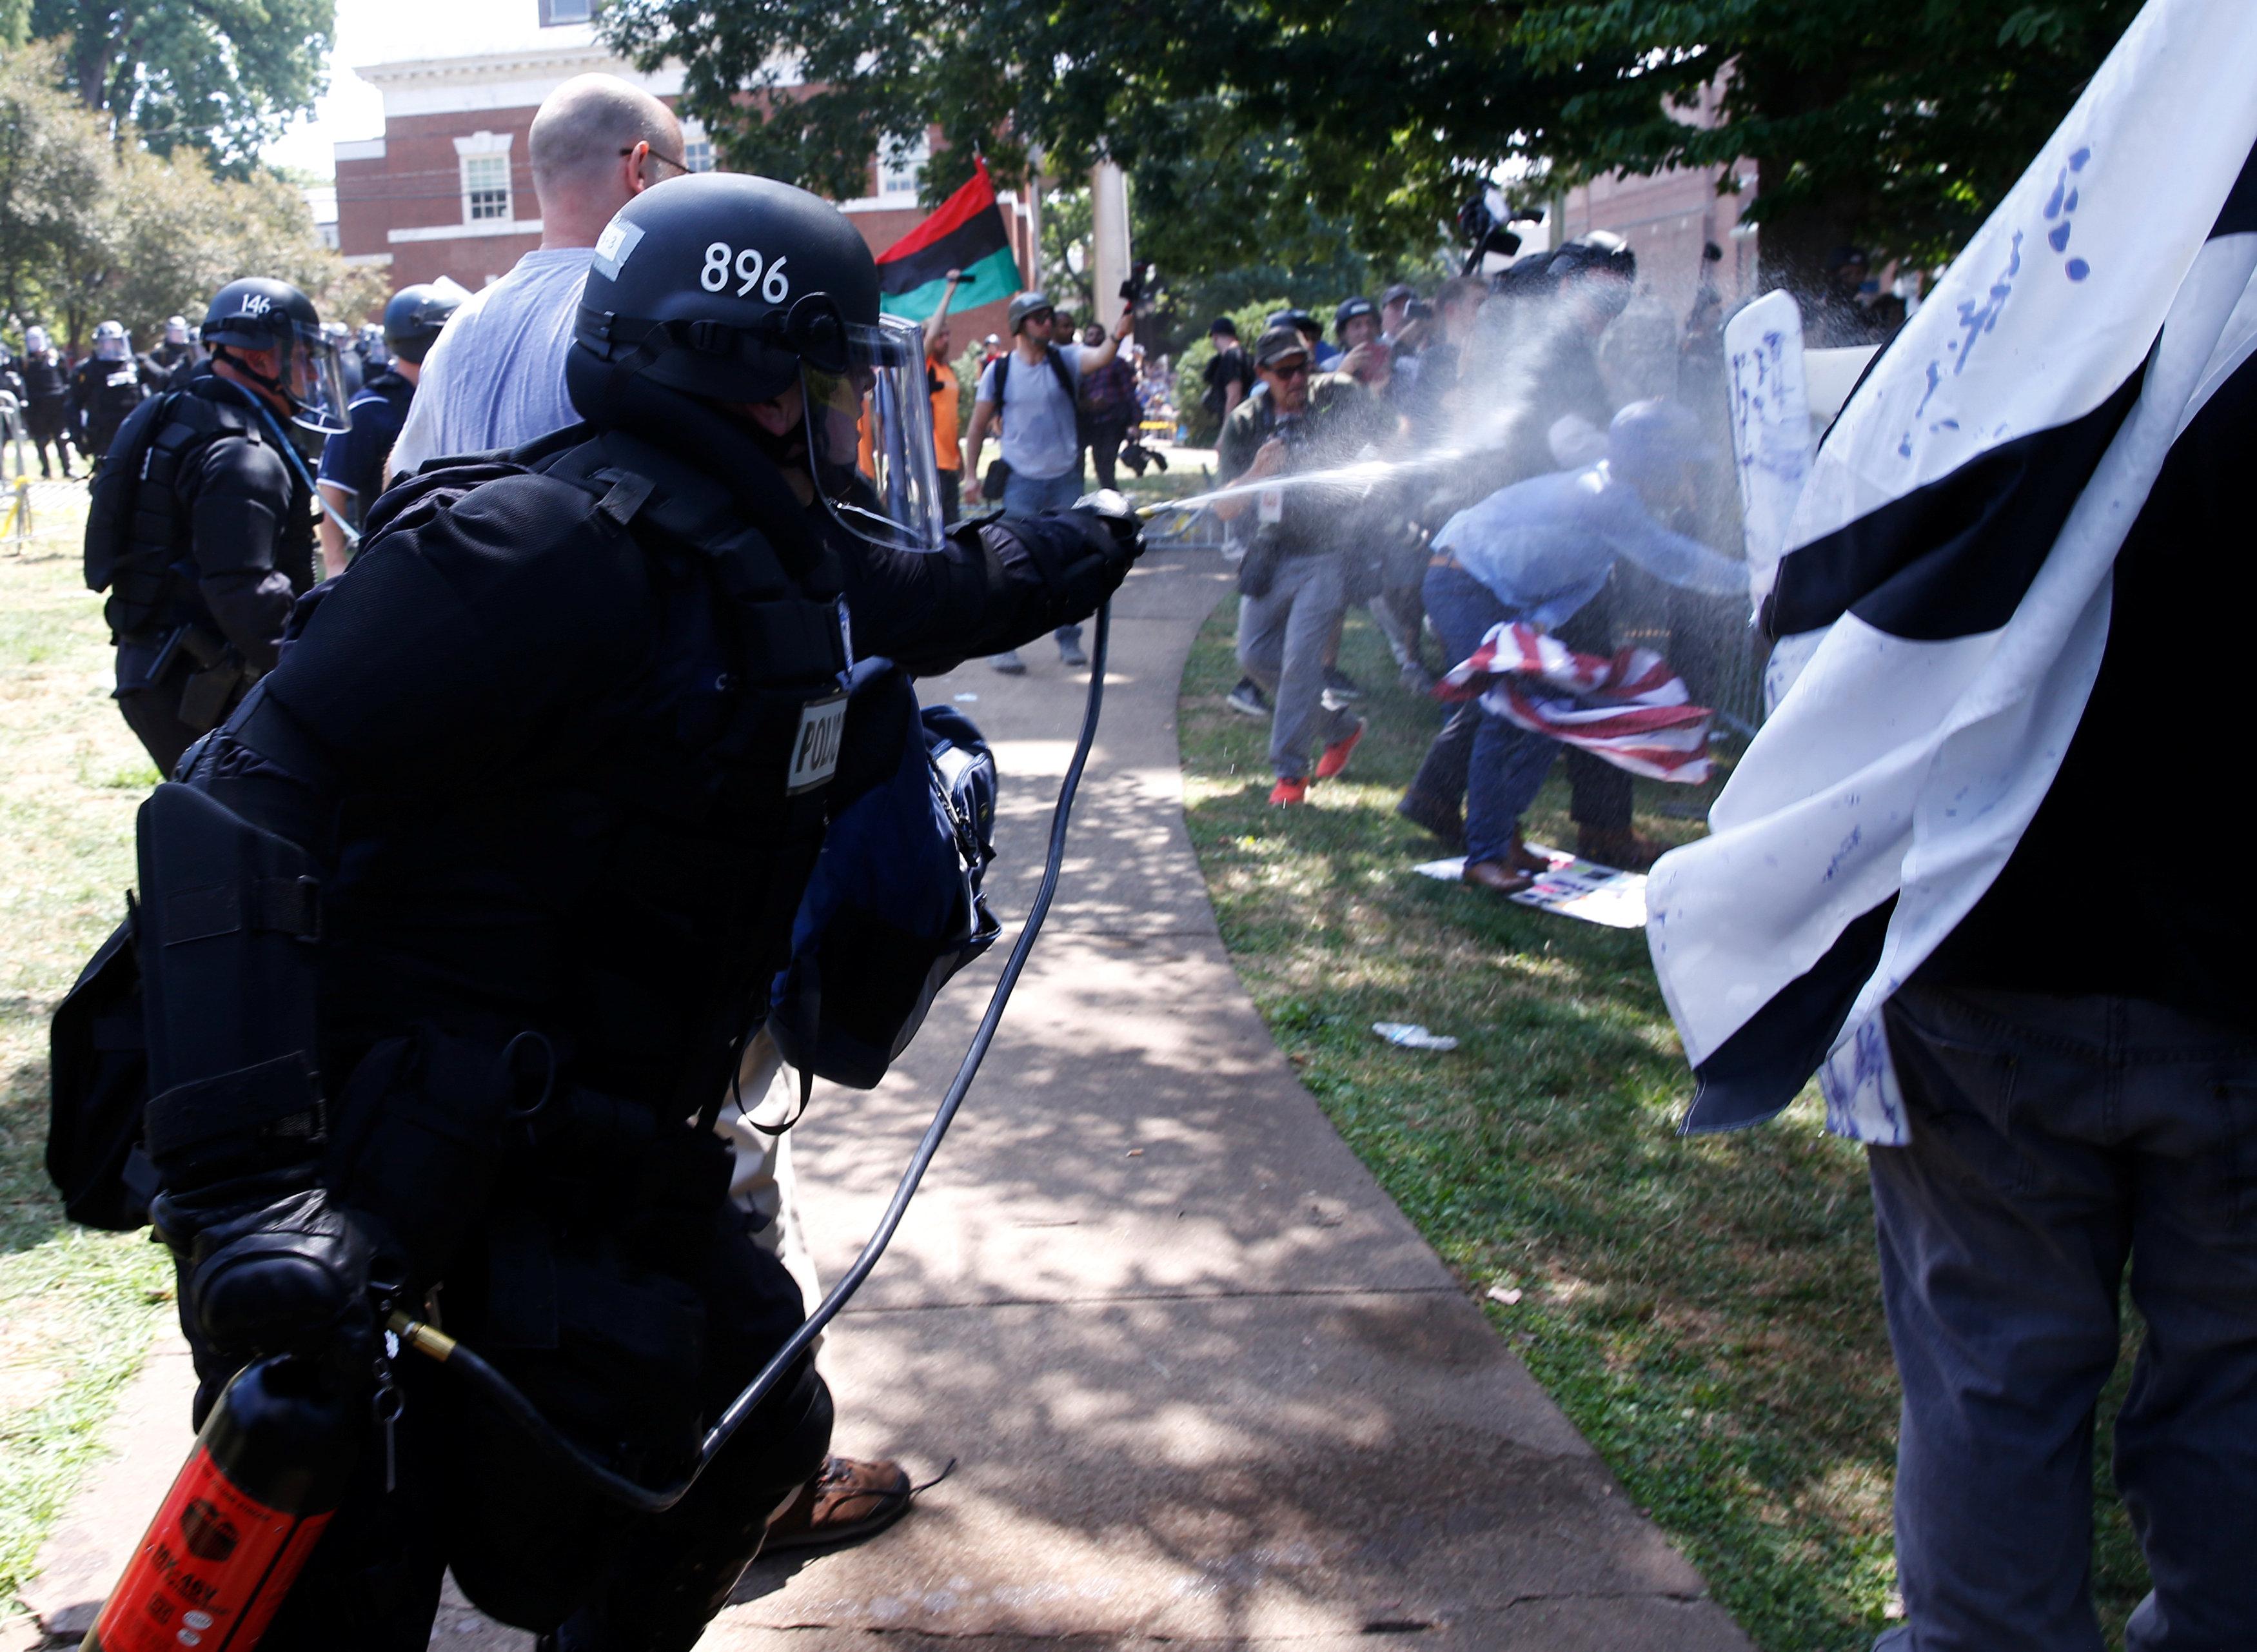 محاولات ابعاد المتظاهرين